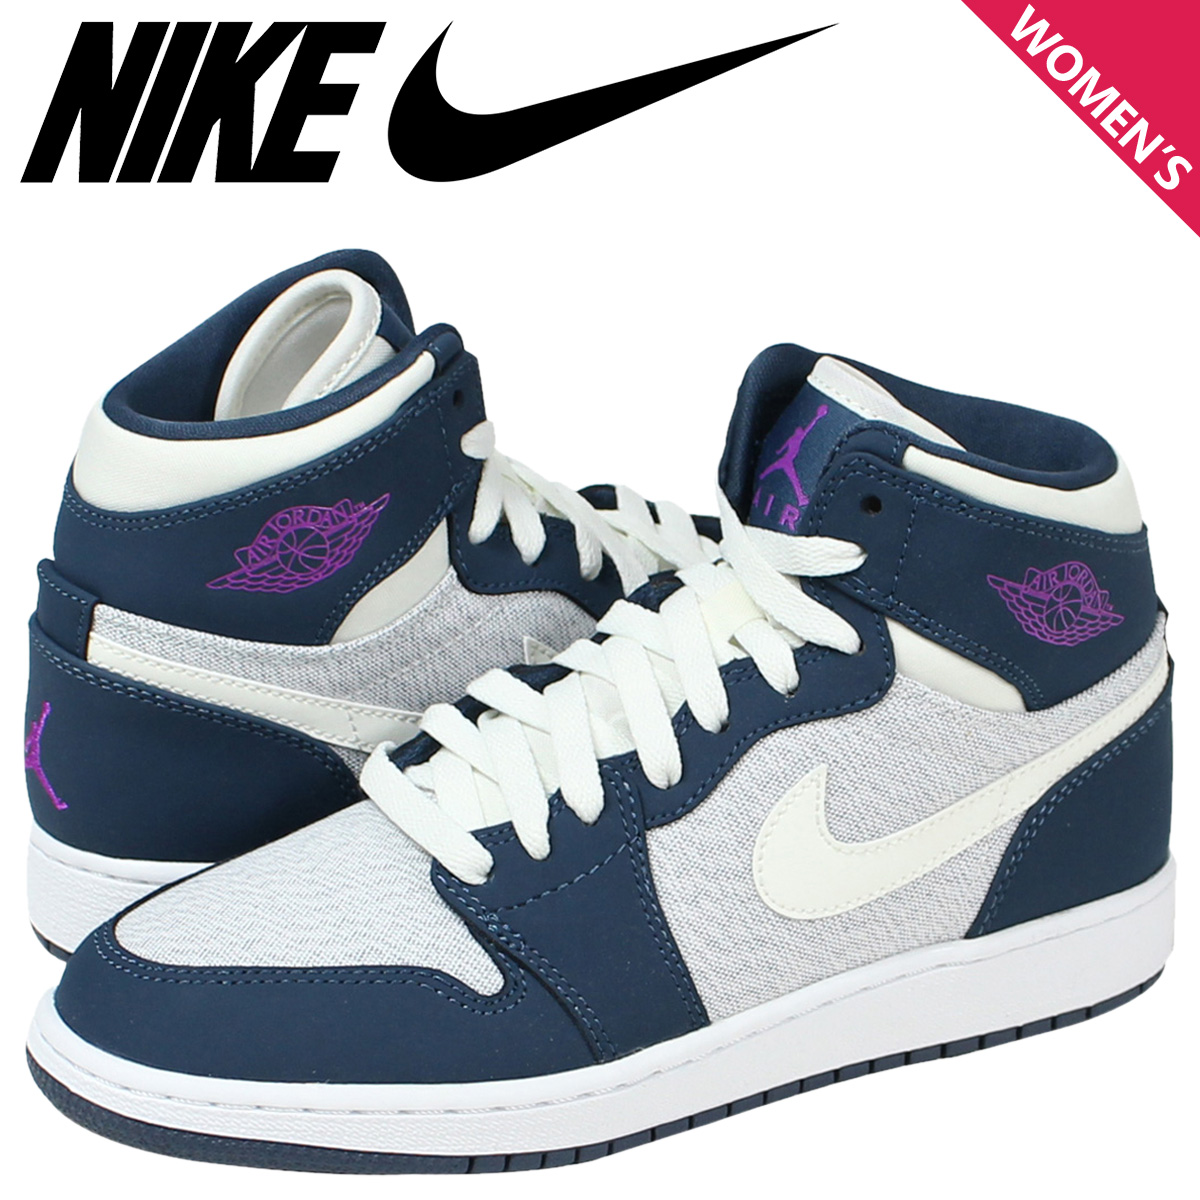 the best attitude c9a66 07c14 [SOLD OUT] Nike NIKE Air Jordan sneakers Womens AIR JORDAN 1 RETRO HI GS  Air Jordan 1 retro Hi 332148-117 shoes Navy